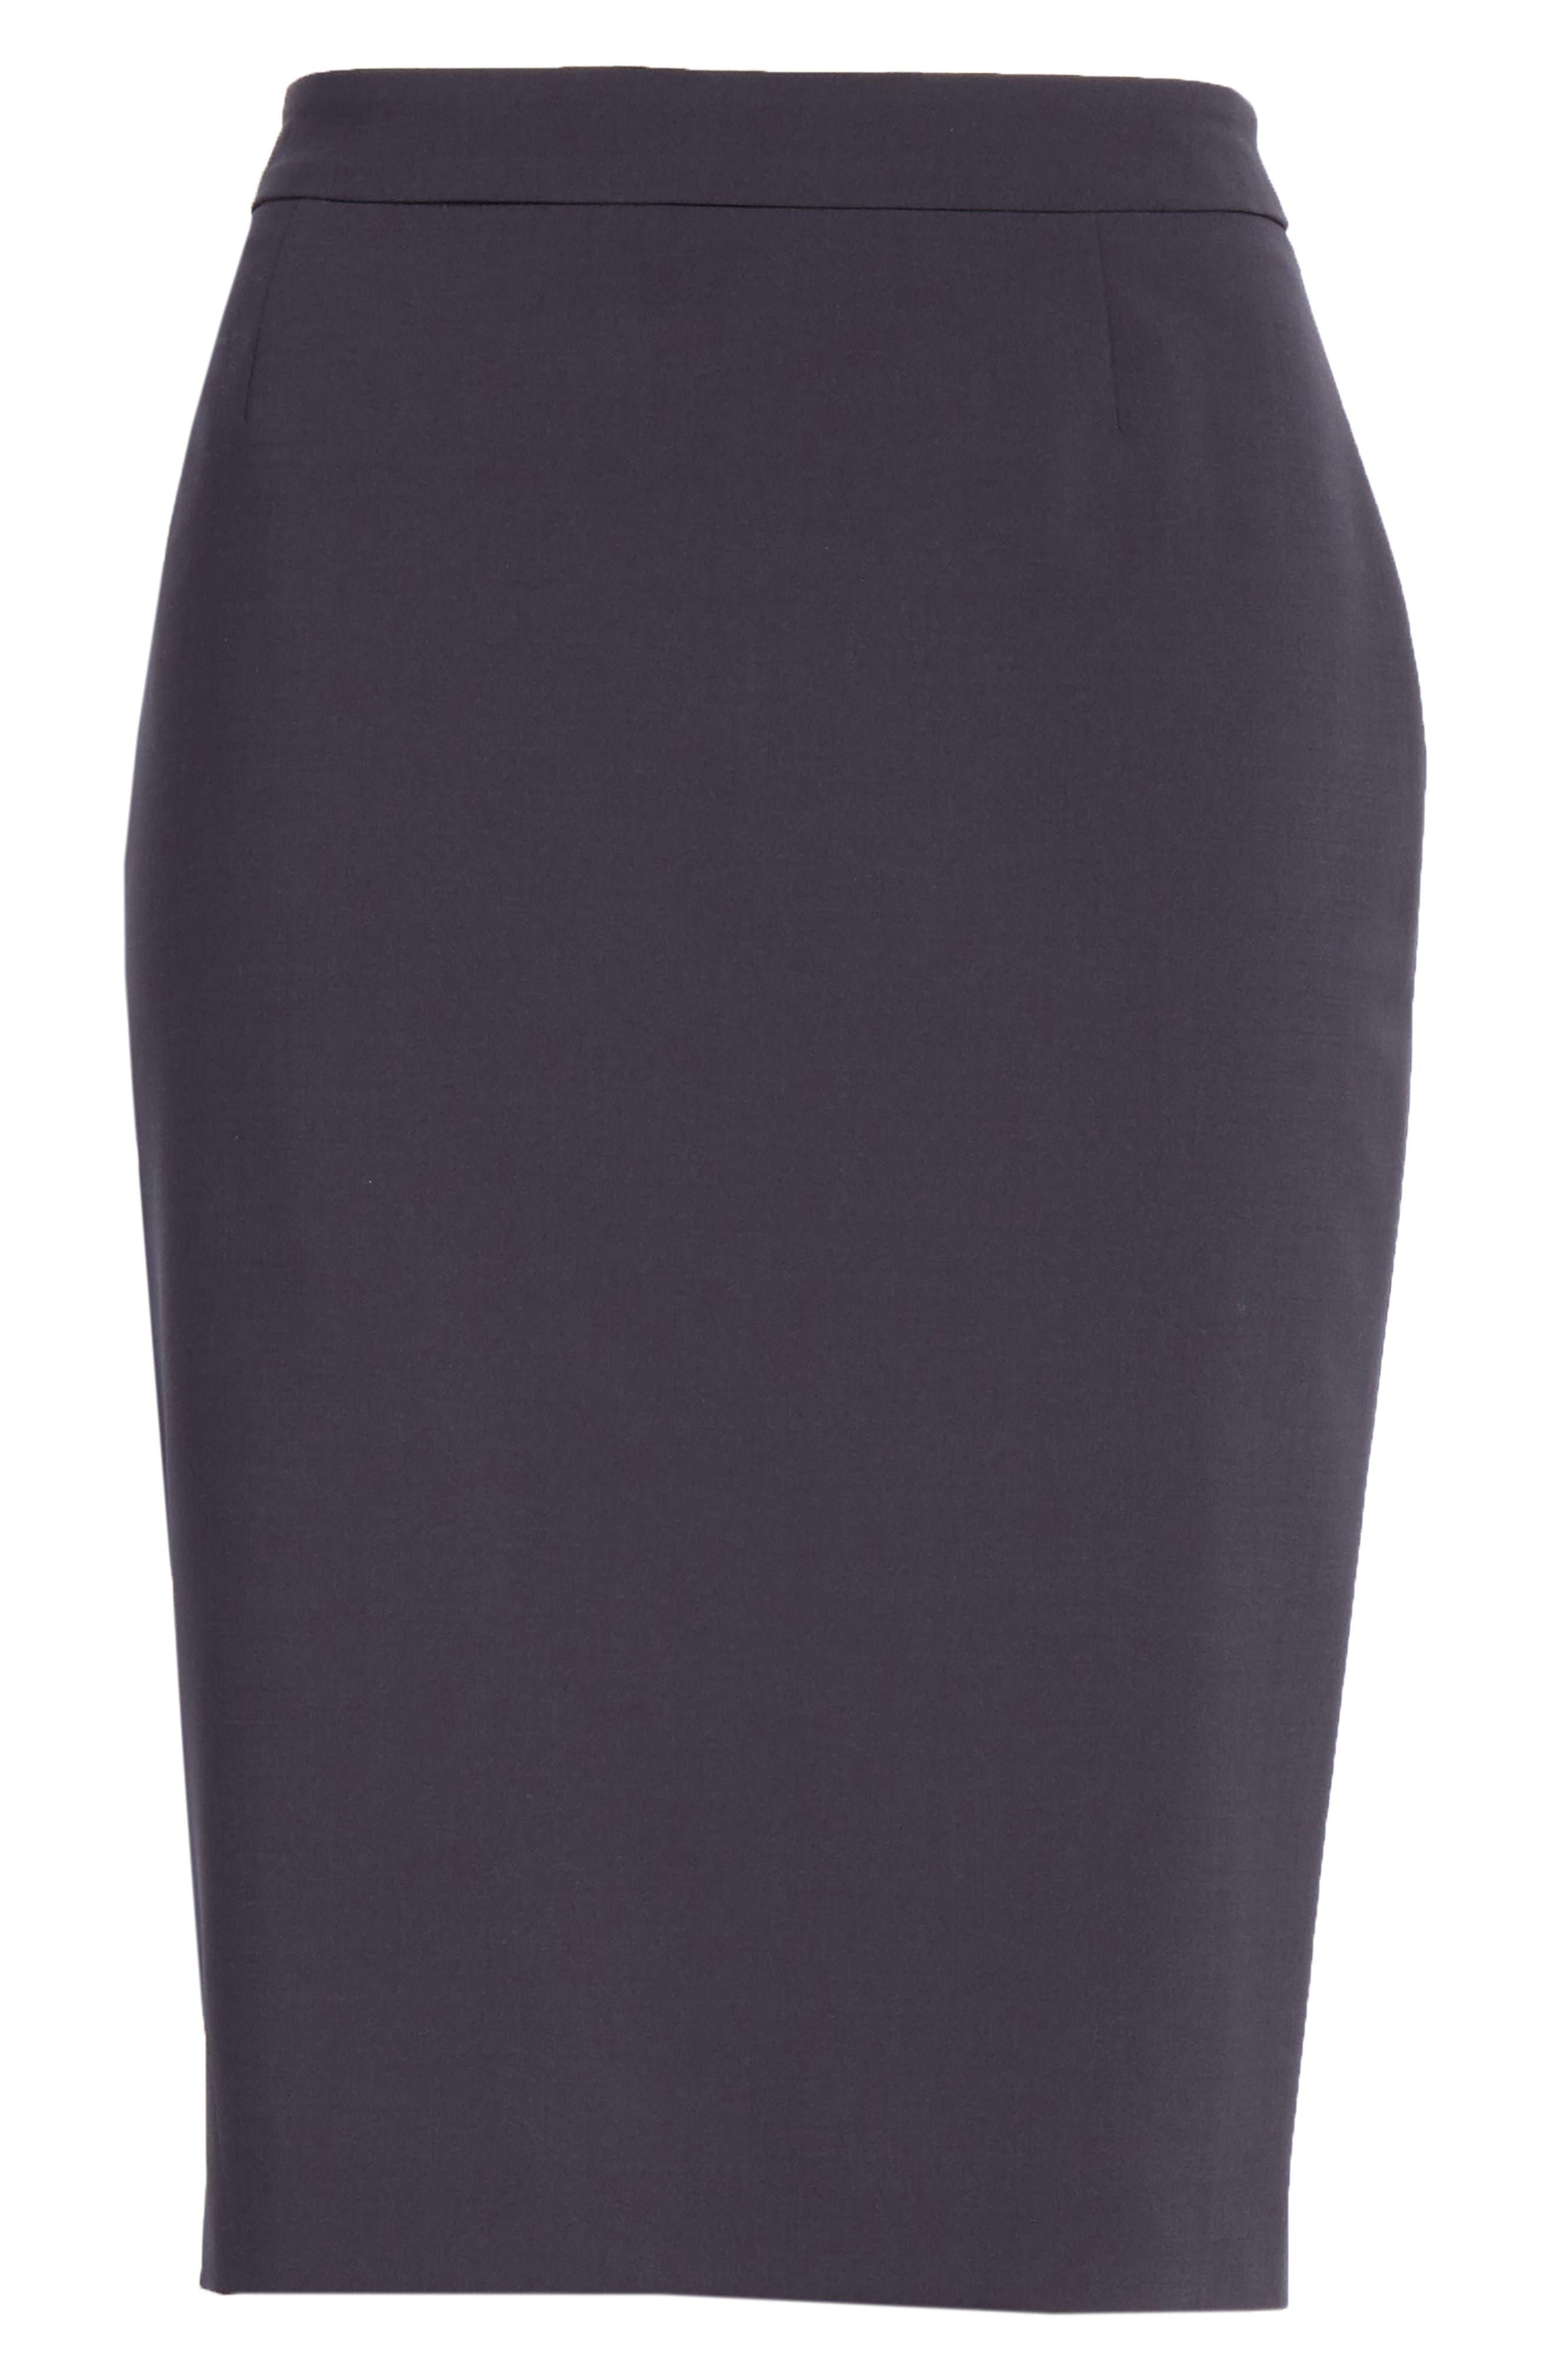 BOSS, Vilea Tropical Stretch Wool Pencil Skirt, Alternate thumbnail 6, color, NAVY